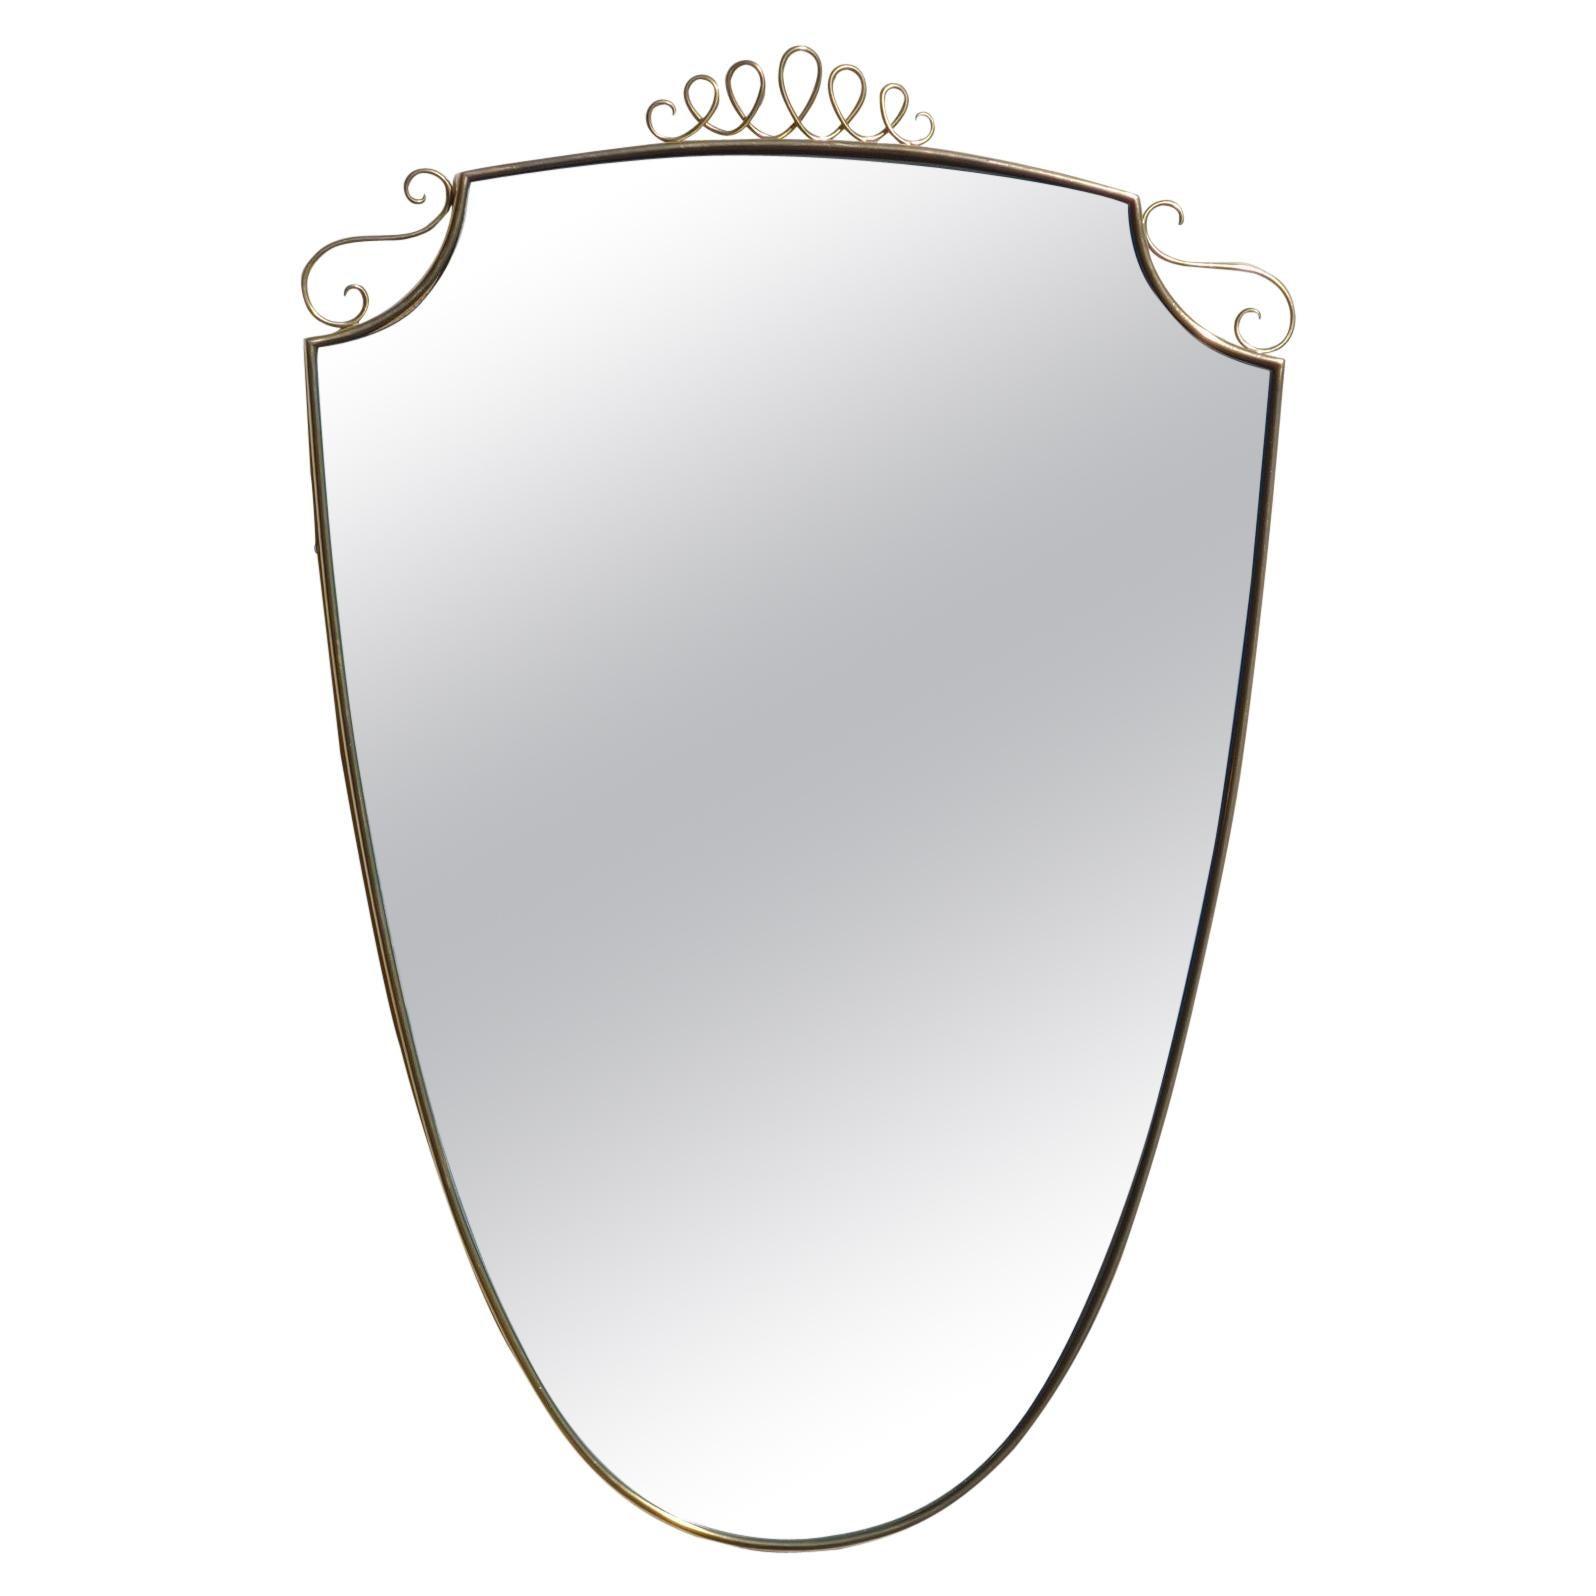 1950s Italian Design Brass Wall Mirror